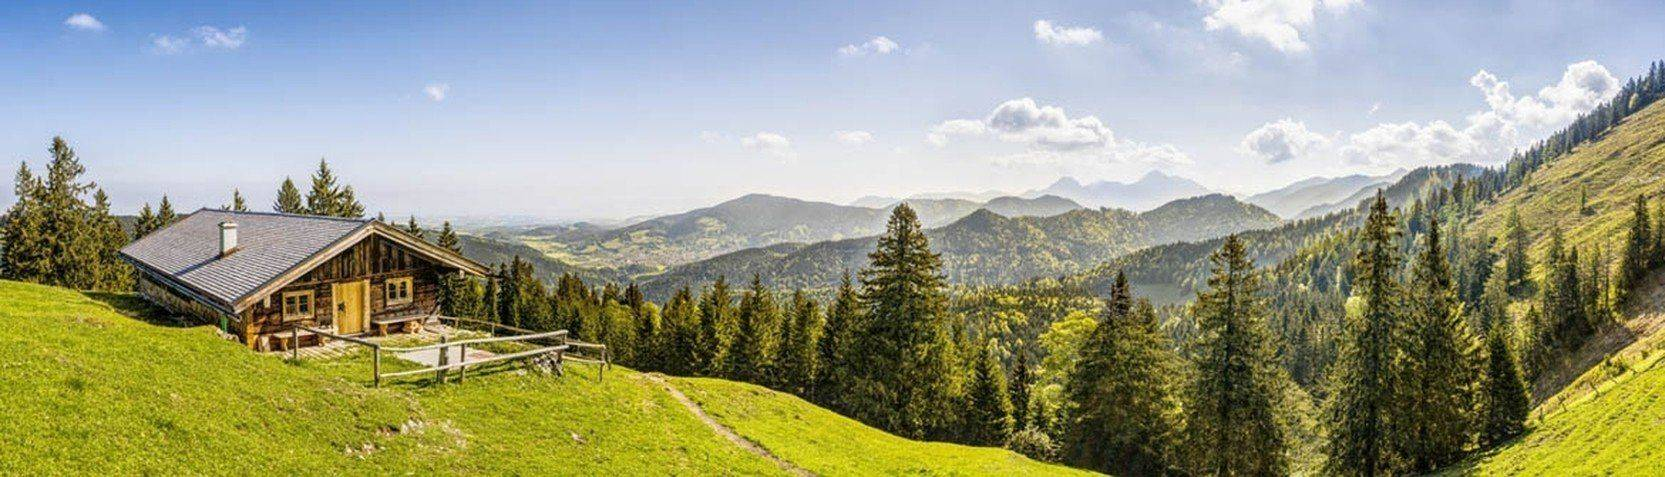 Fotografia - Góry i doliny